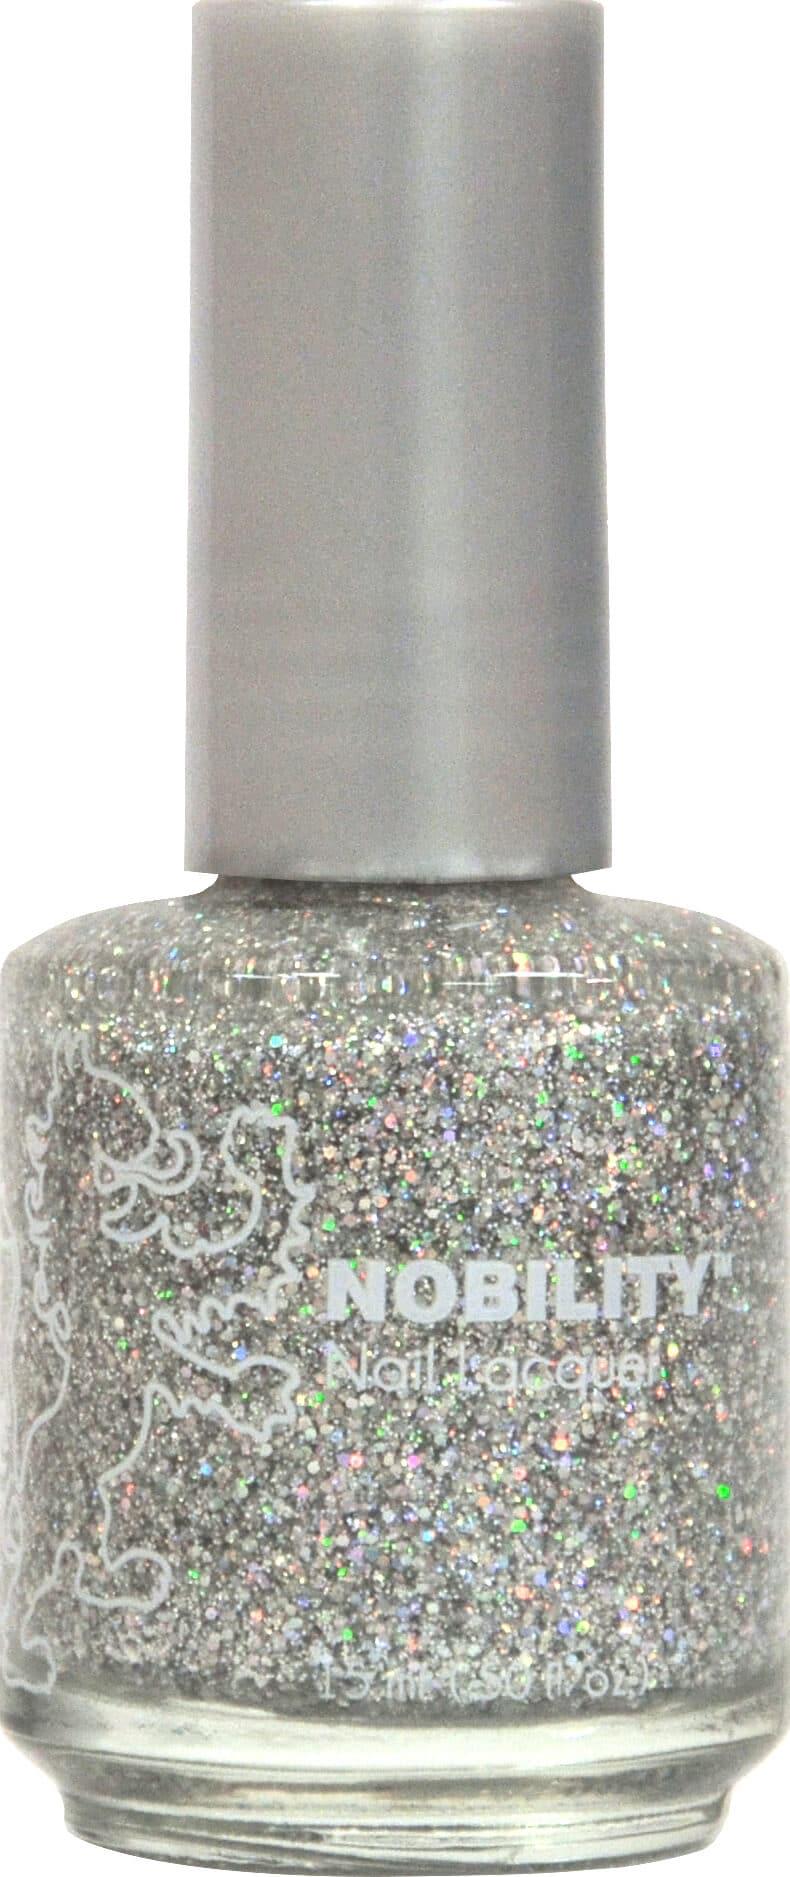 Nobility Nail Lacquer - Silver Glitz | LeChat Nails